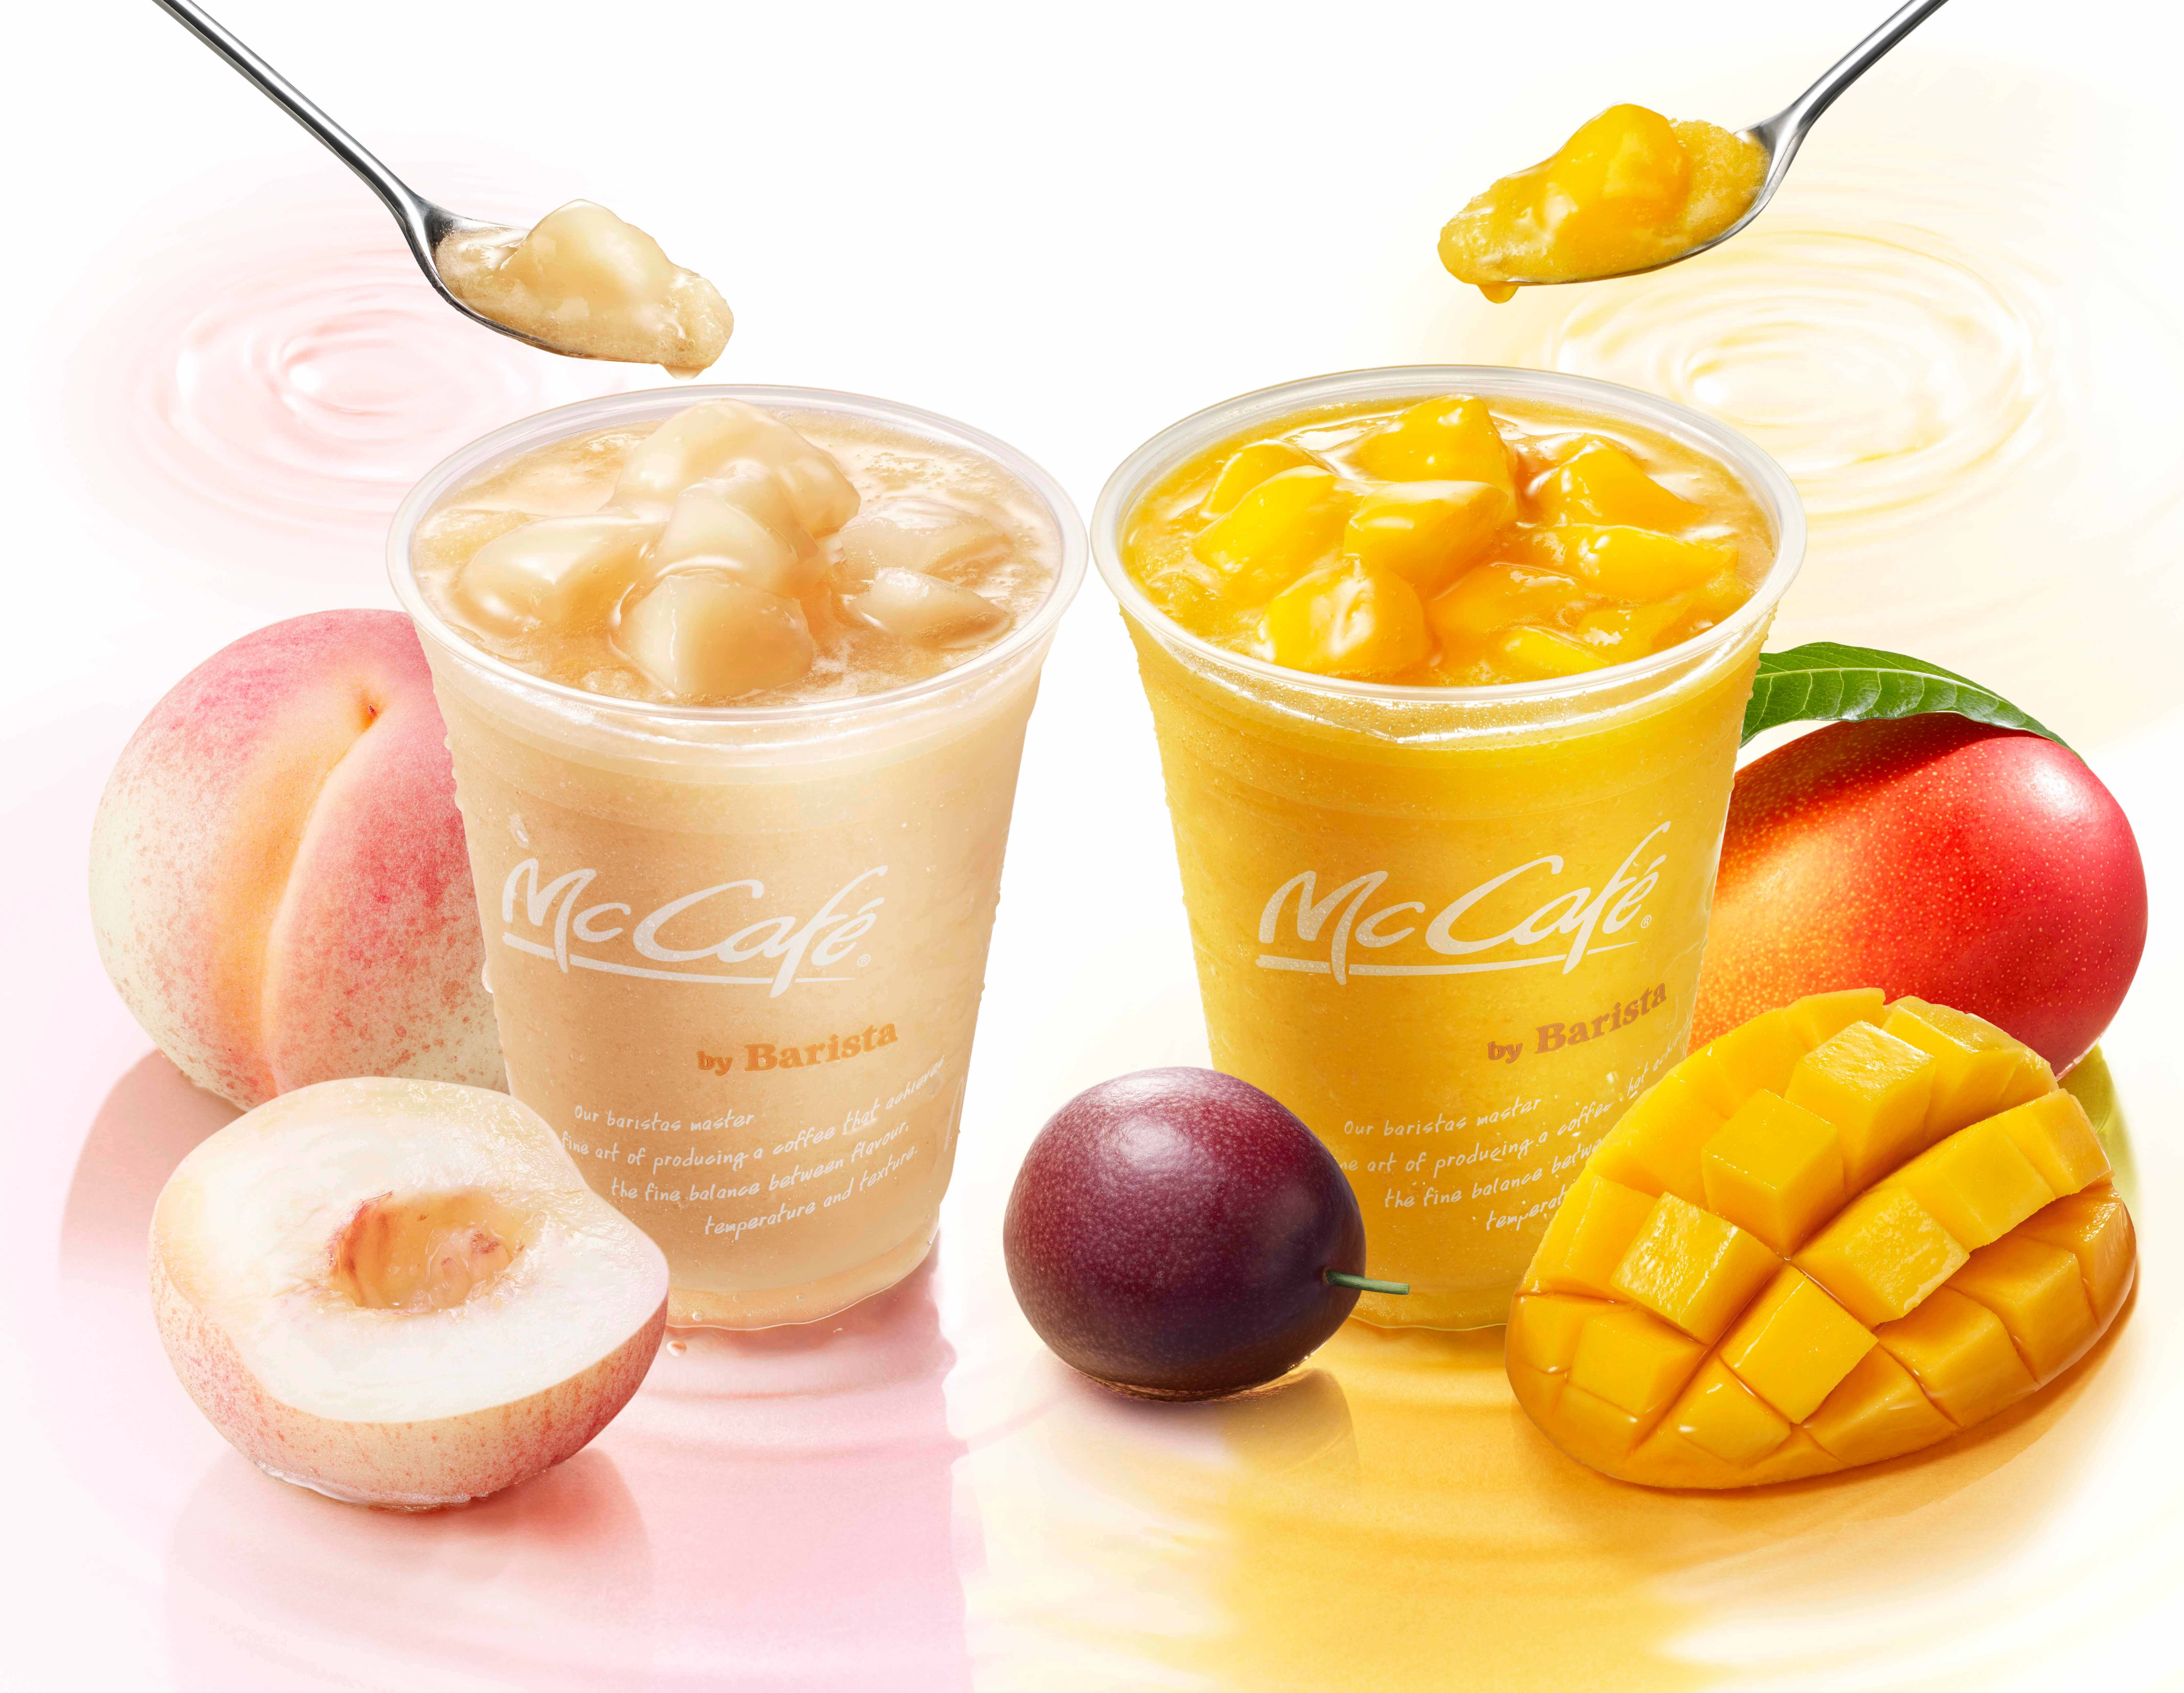 mccafe mcdonald POPバリスタ「桃のスムージー」「マンゴー&パッションフルーツスムージー」 barista peach smoothie mango pashion fruits smootie